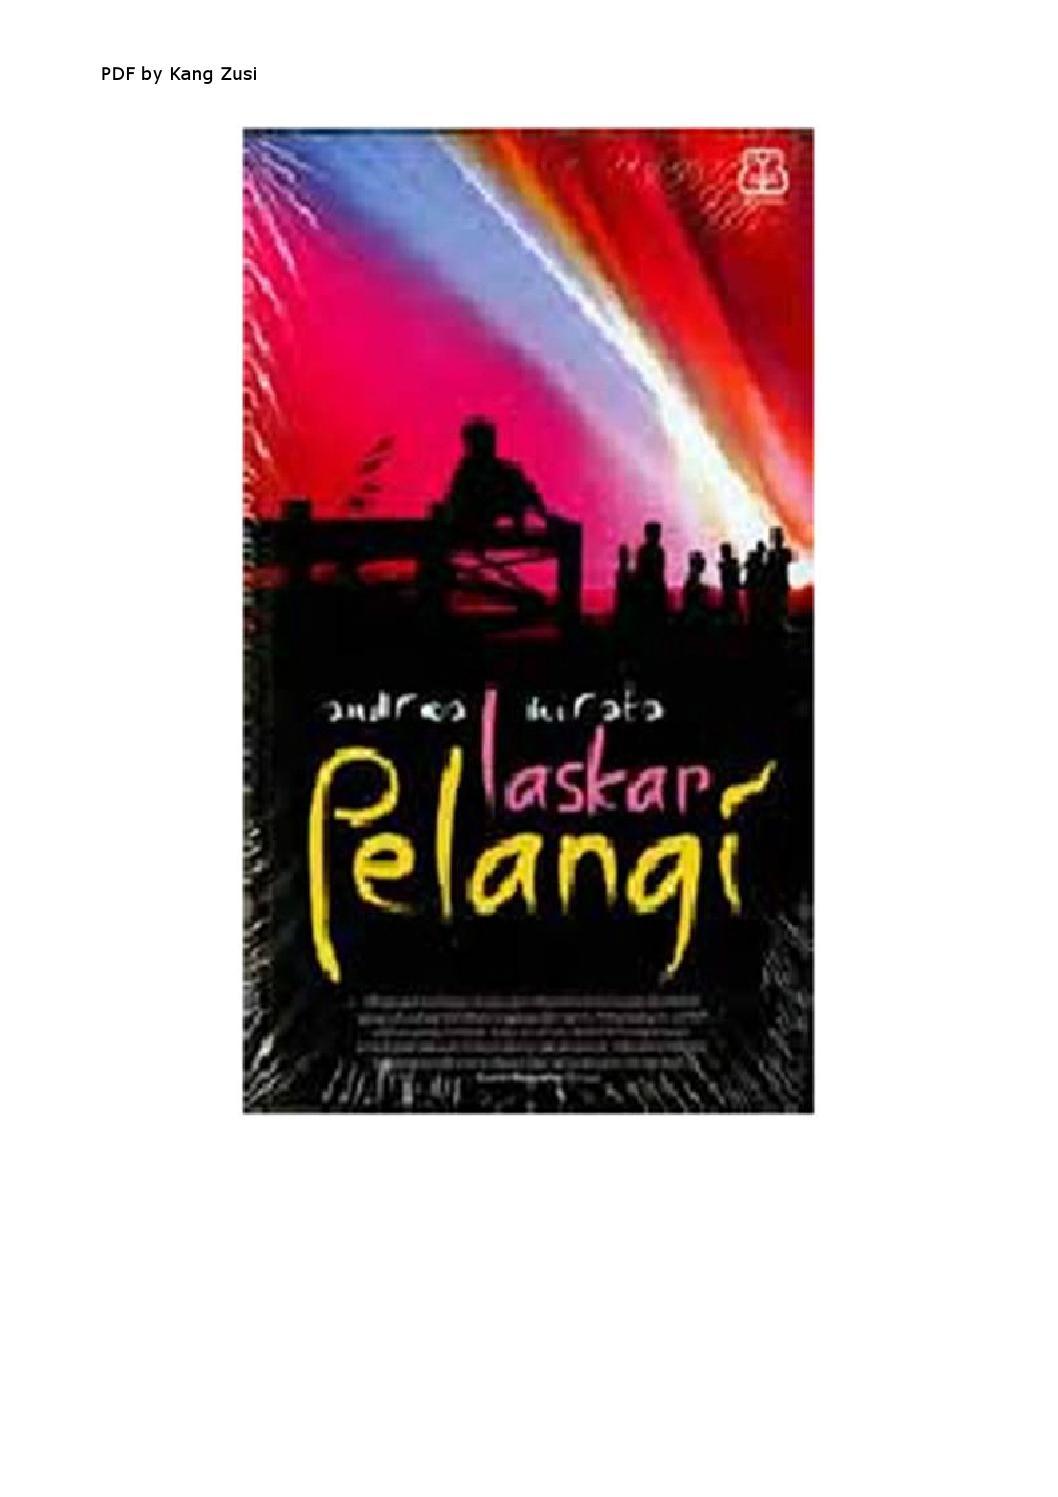 Laskar Pelangi By Yuda Prawira Issuu